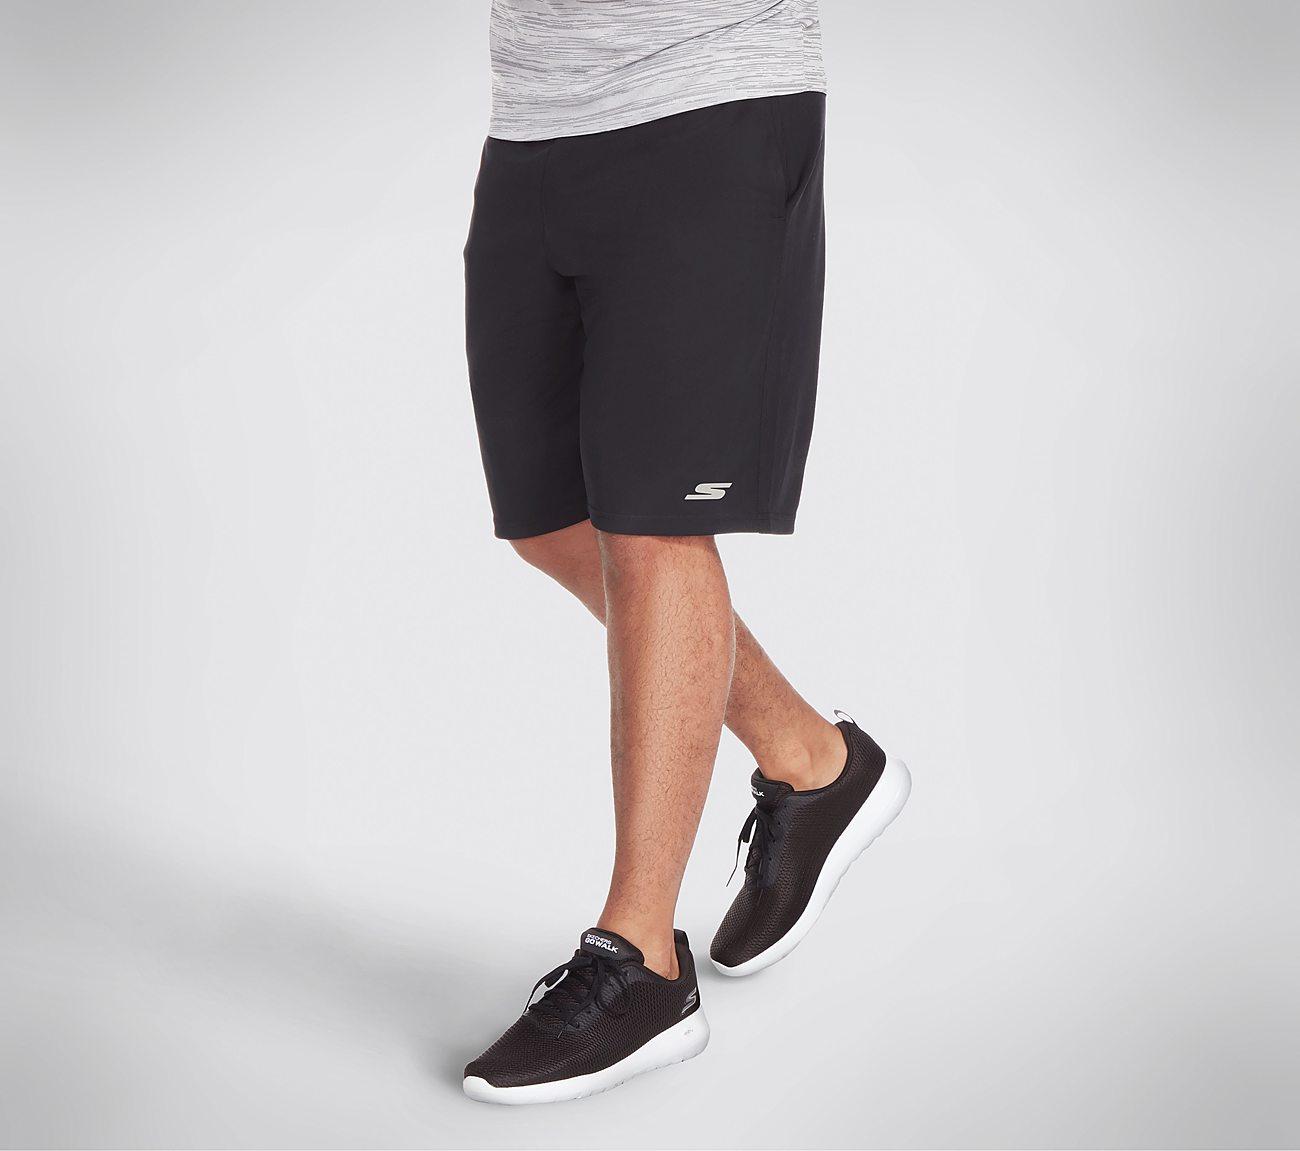 Skechers Apparel Switchback 10 Inch Short